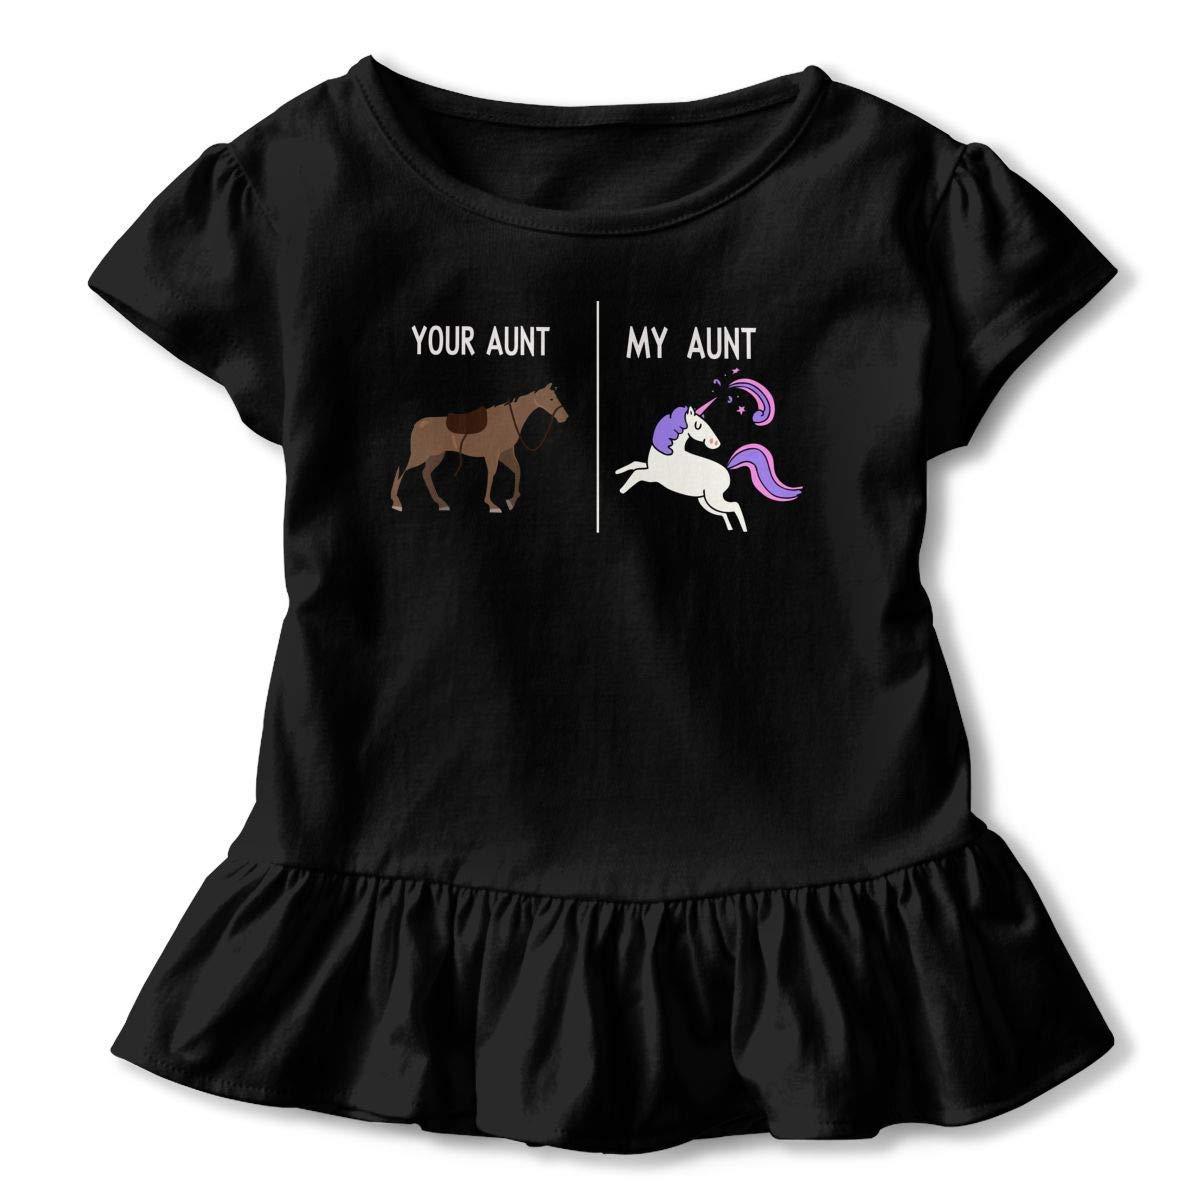 lu fangfangc Your Aunt My Aunt Horse Unicorn Toddler Girls T Shirt Kids Cotton Short Sleeve Ruffle Tee